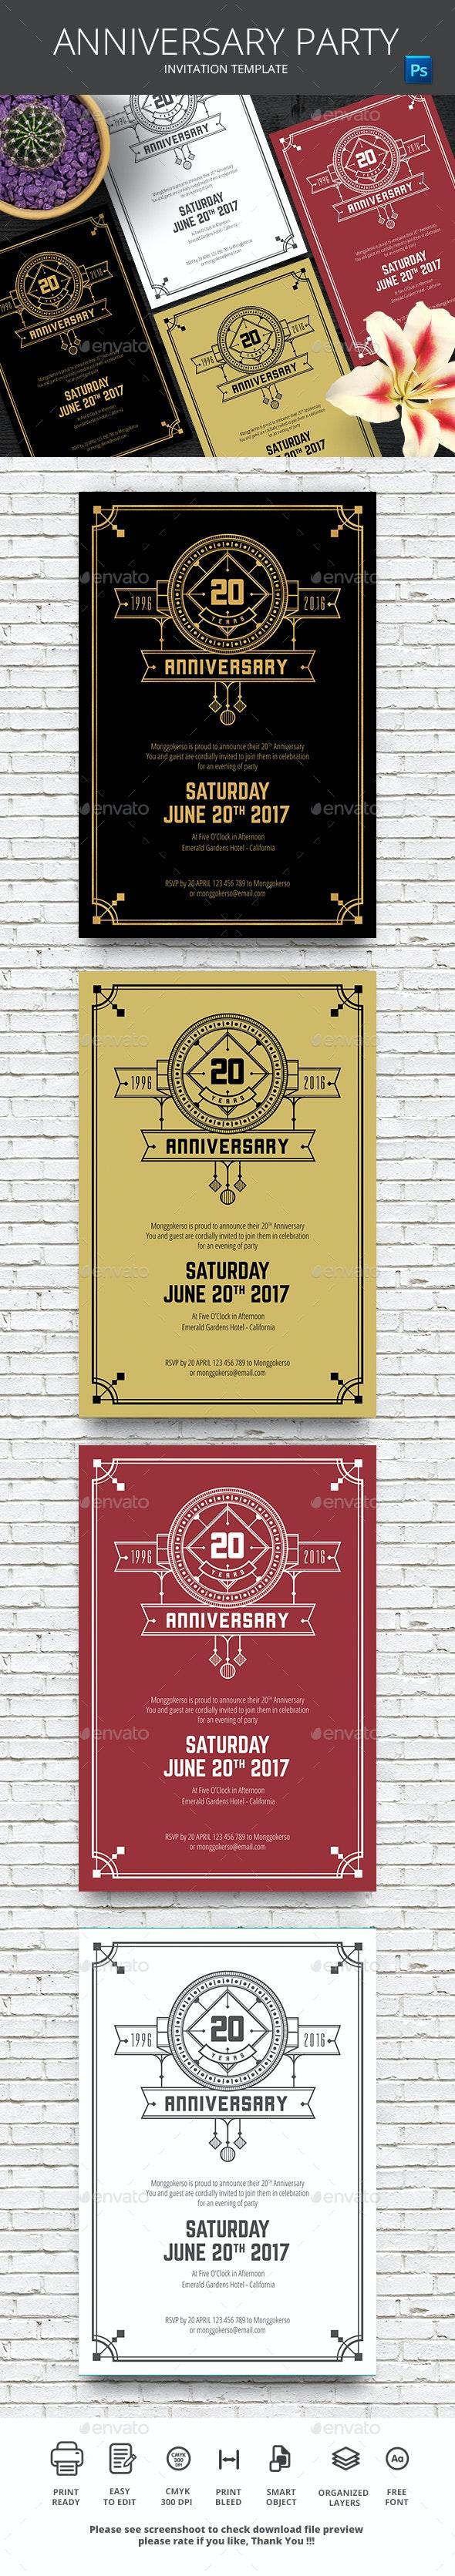 Anniversary Invitation - Weddings Cards & Invites